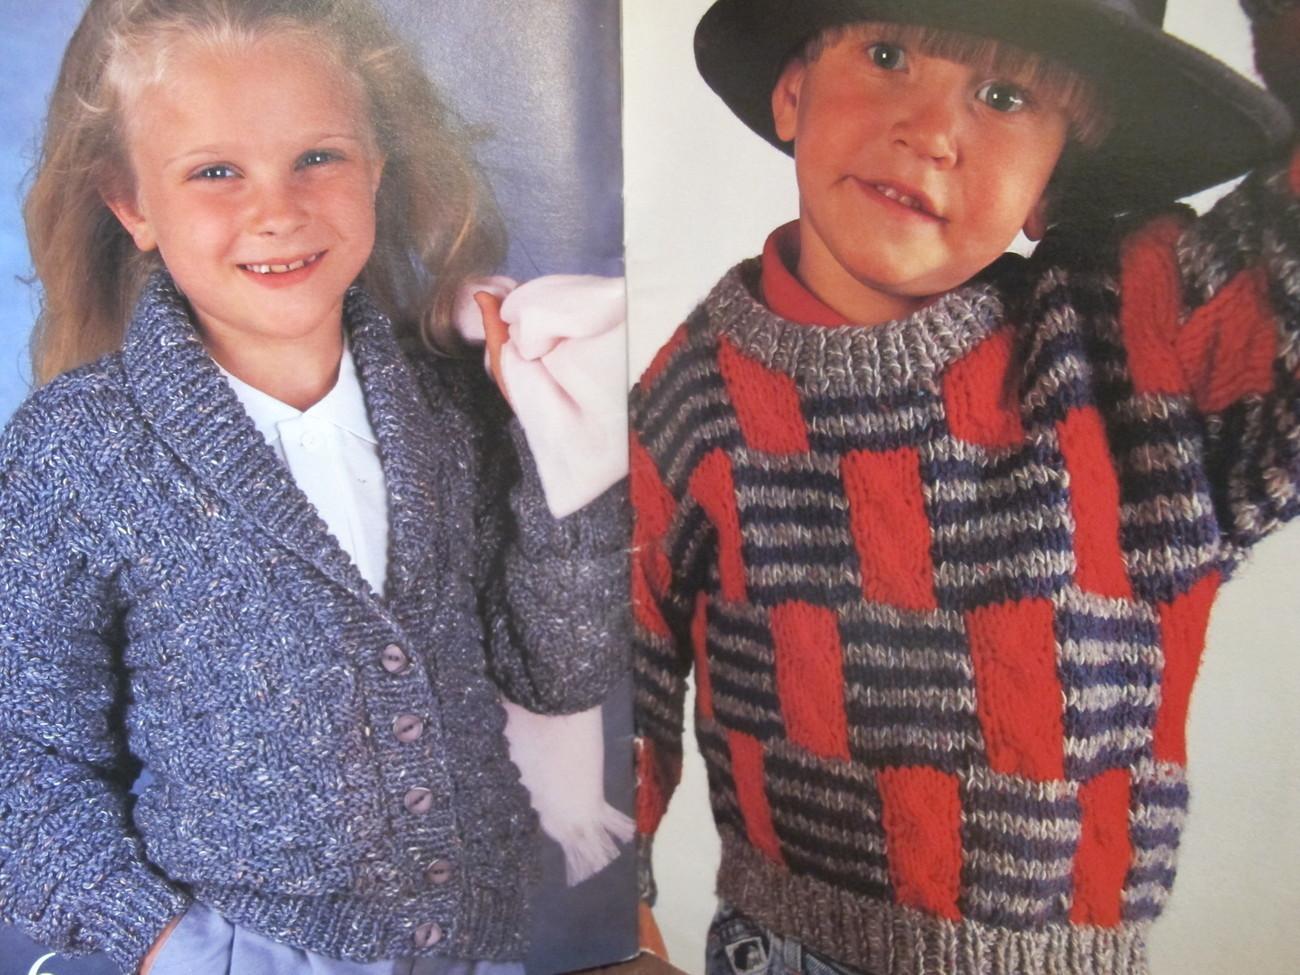 Shetland Chunky Knitting Patterns Pullovers Cardigans Jackets Sweaters CHILDREN